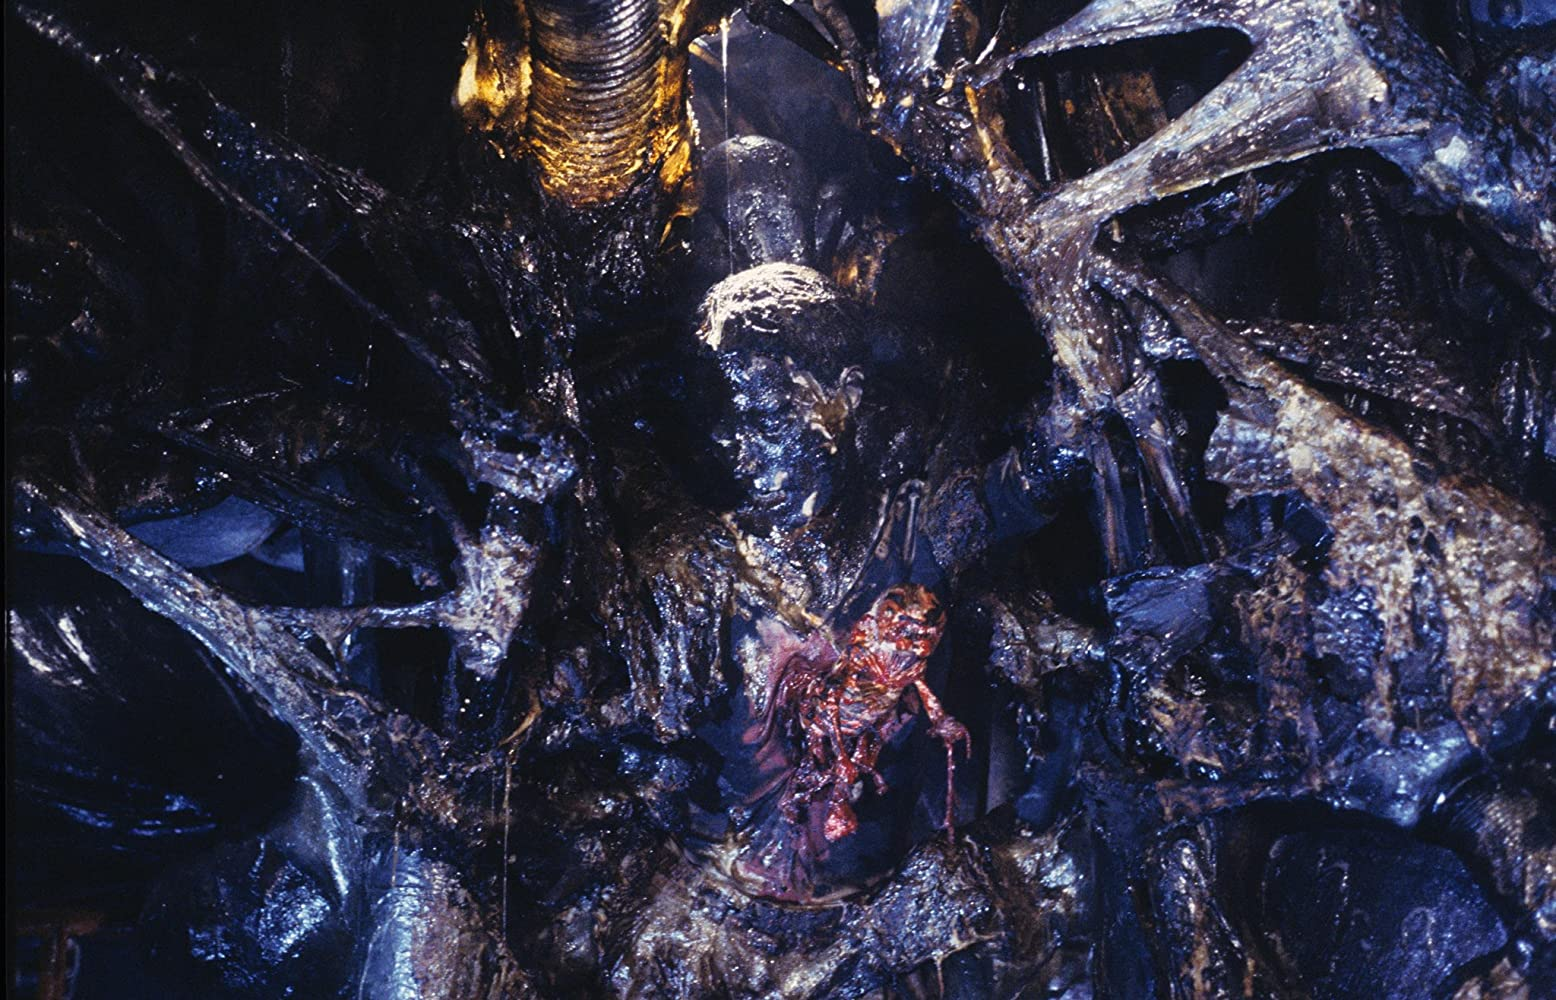 Barbara Coles in Aliens (1986)